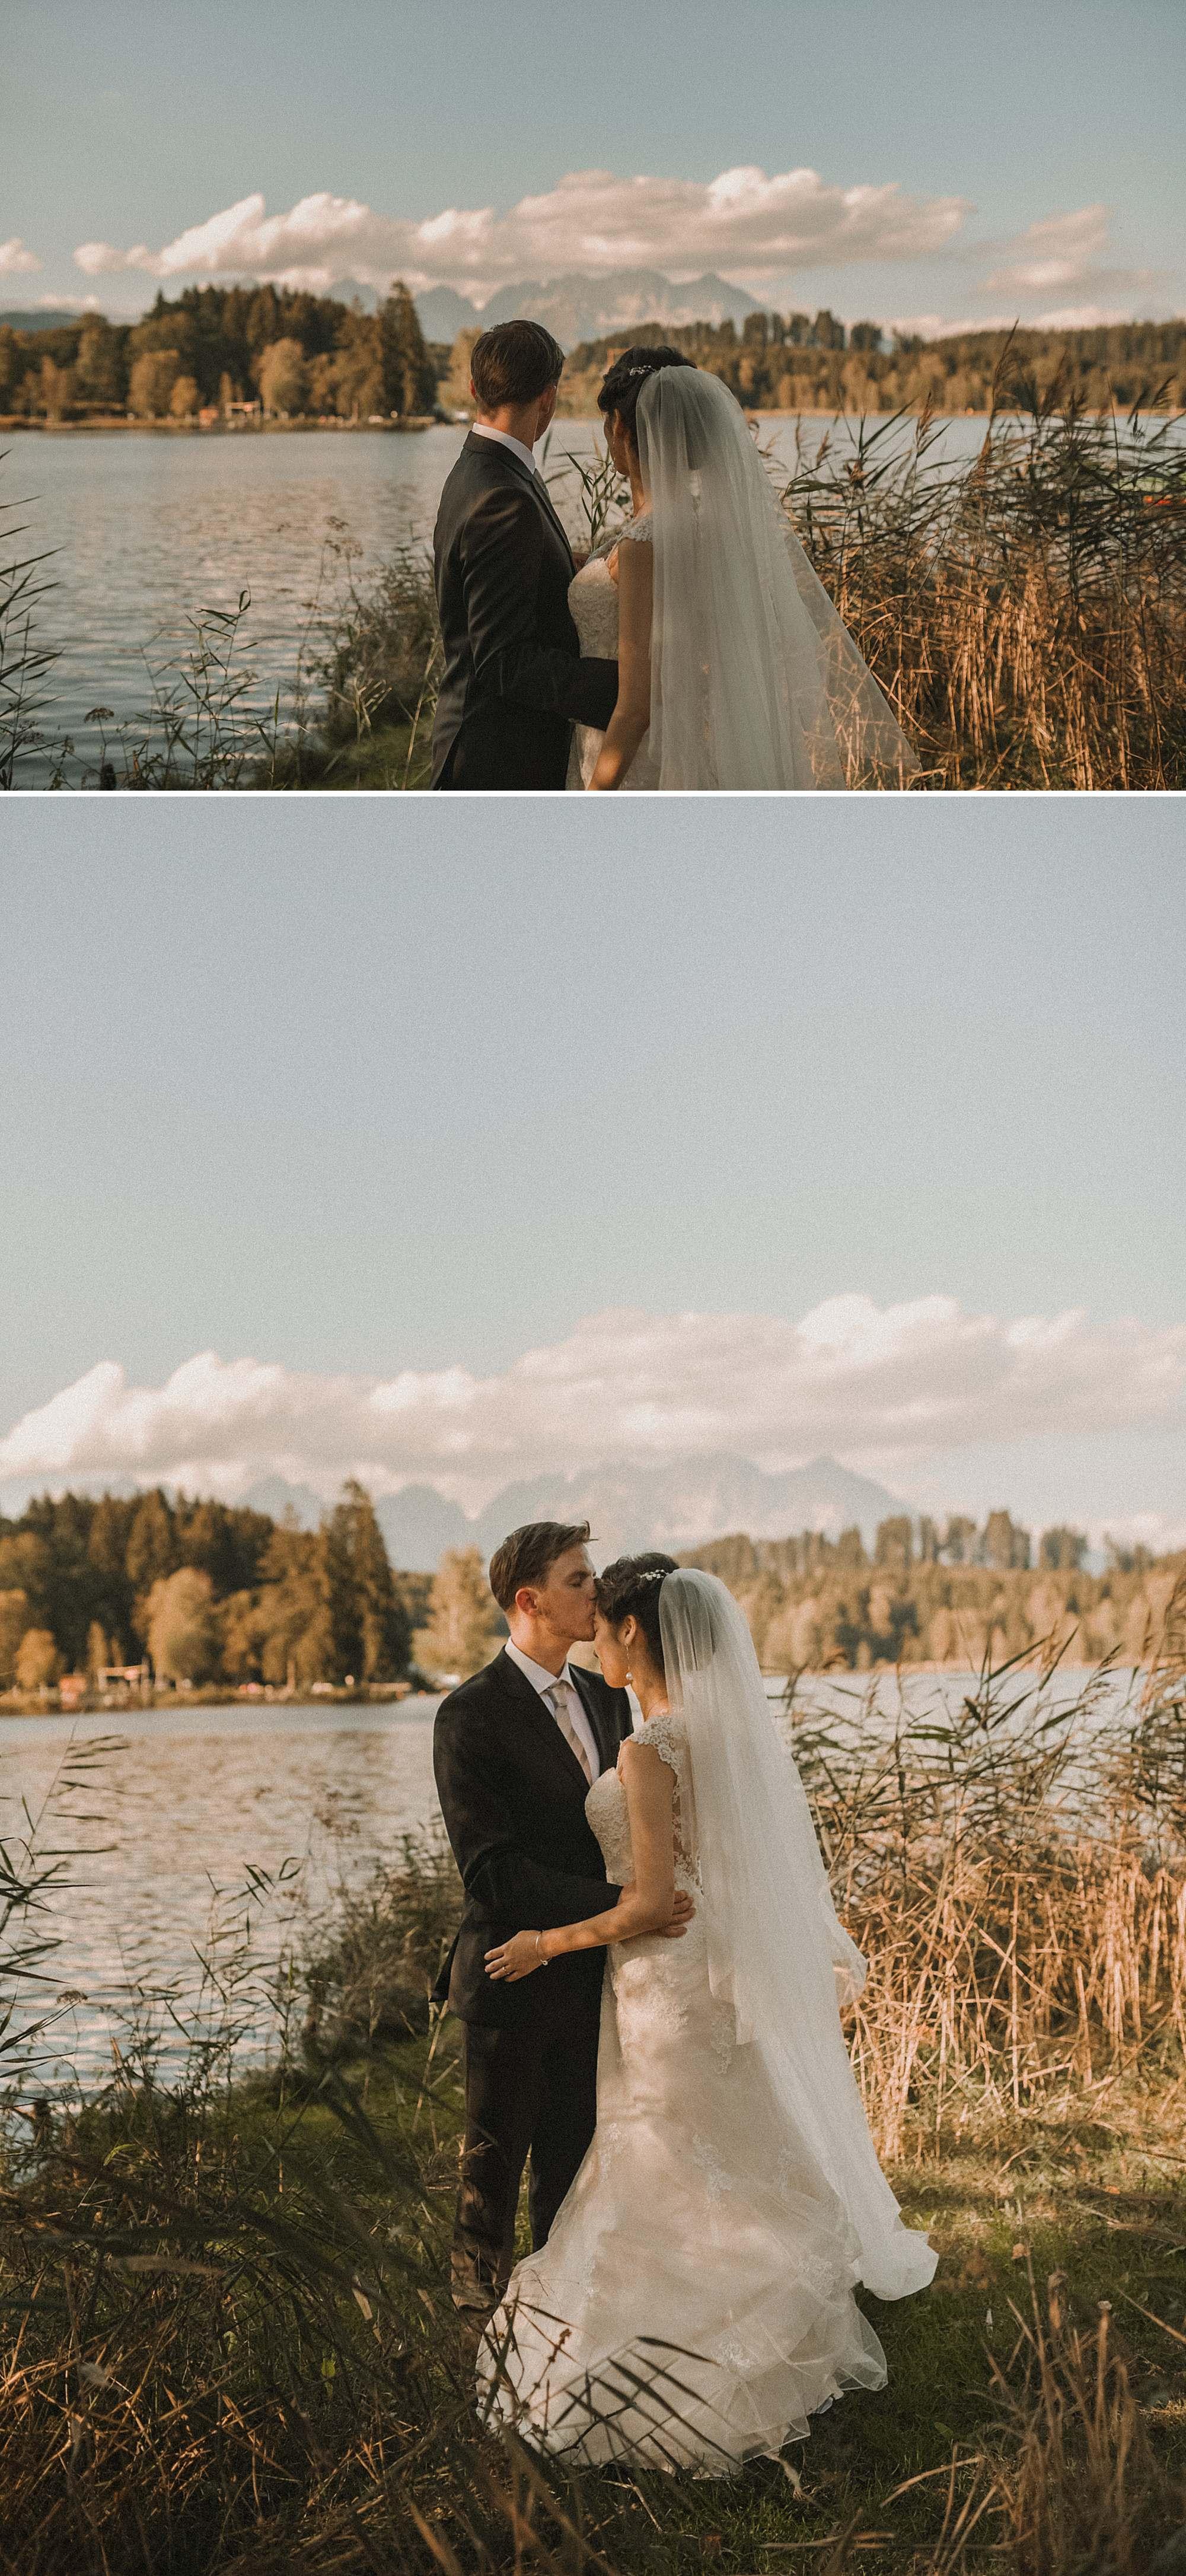 kitzbuehel wedding photographer_0059.jpg